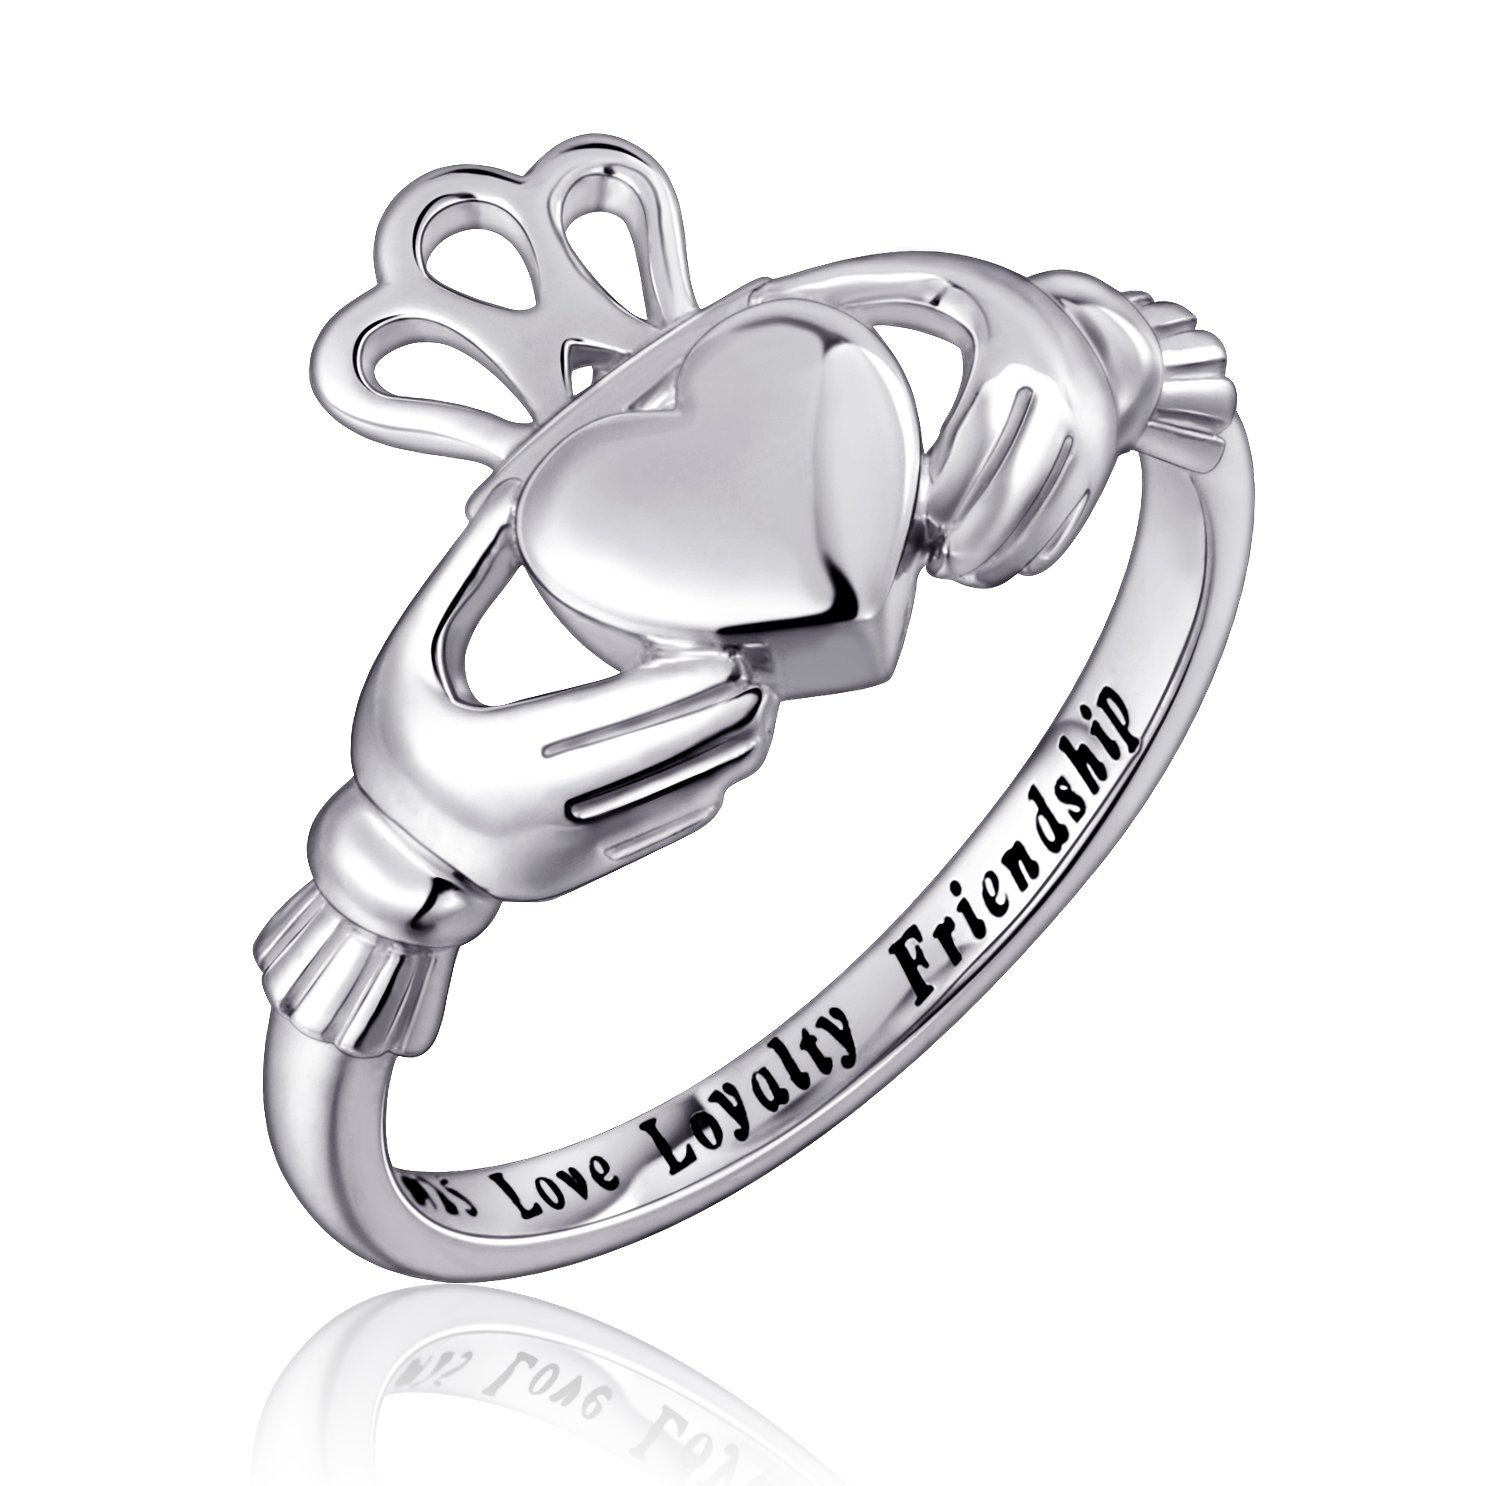 S925 Sterling Silver Love Loyalty Friendship Irish Ladies' Claddagh Ring (sterling-silver, 7)